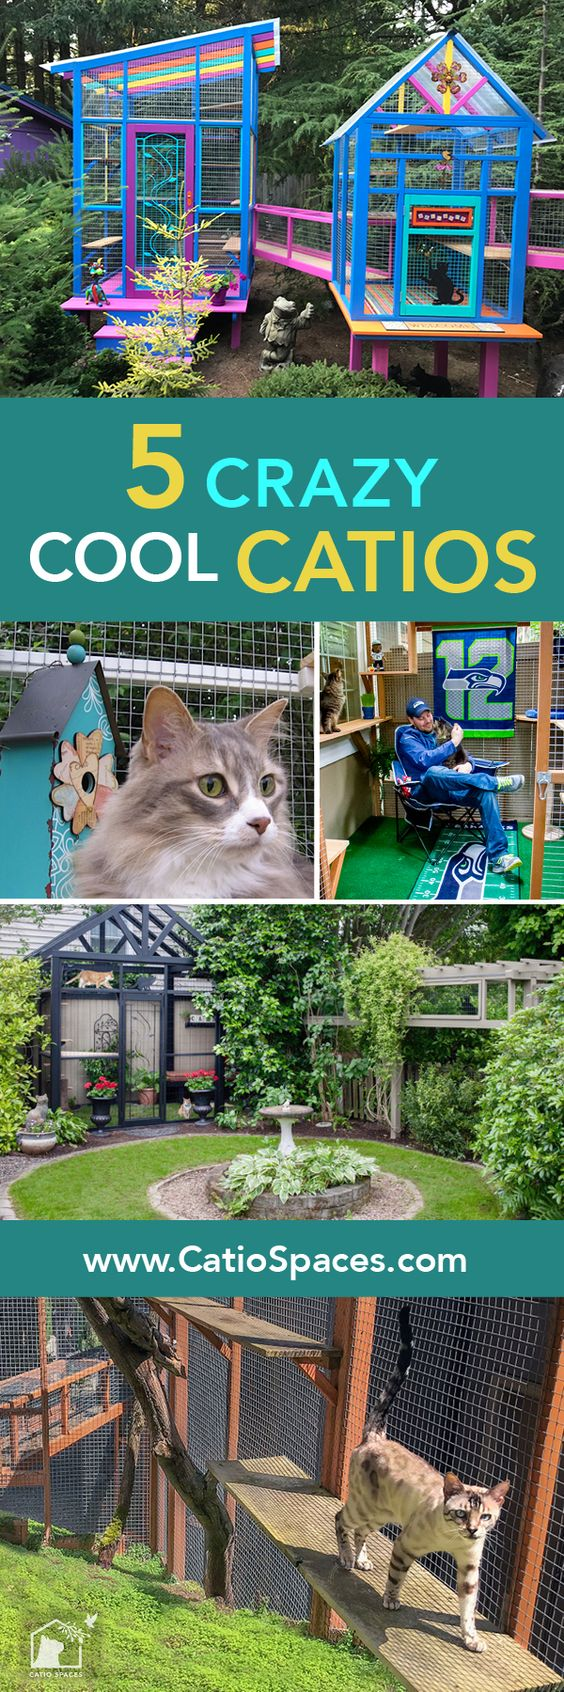 5 crazy cool catios you have to see! #catiolife #catpatio #catio #diycatpatio